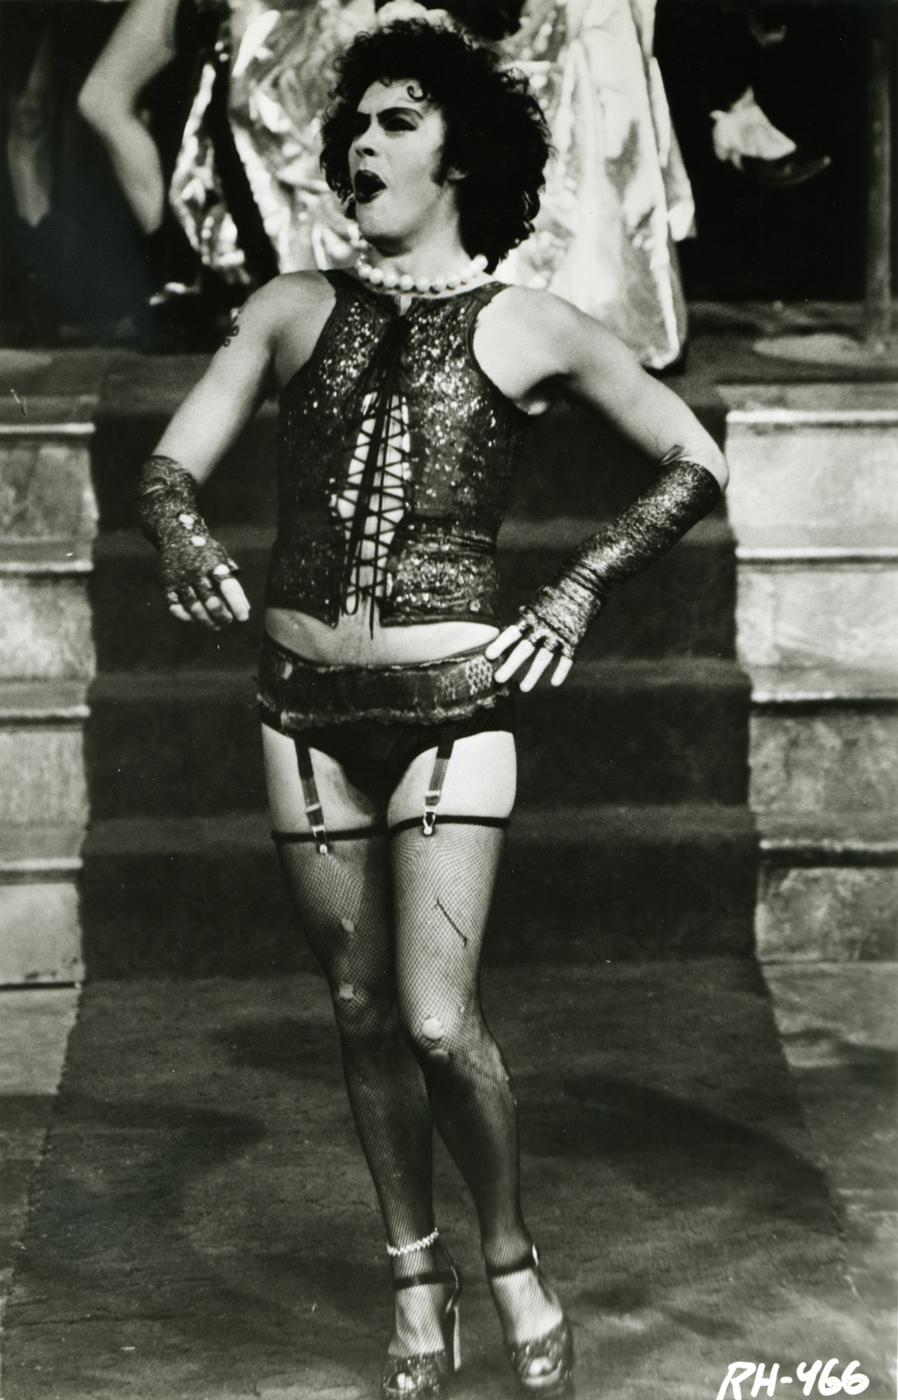 Transvestite leg show